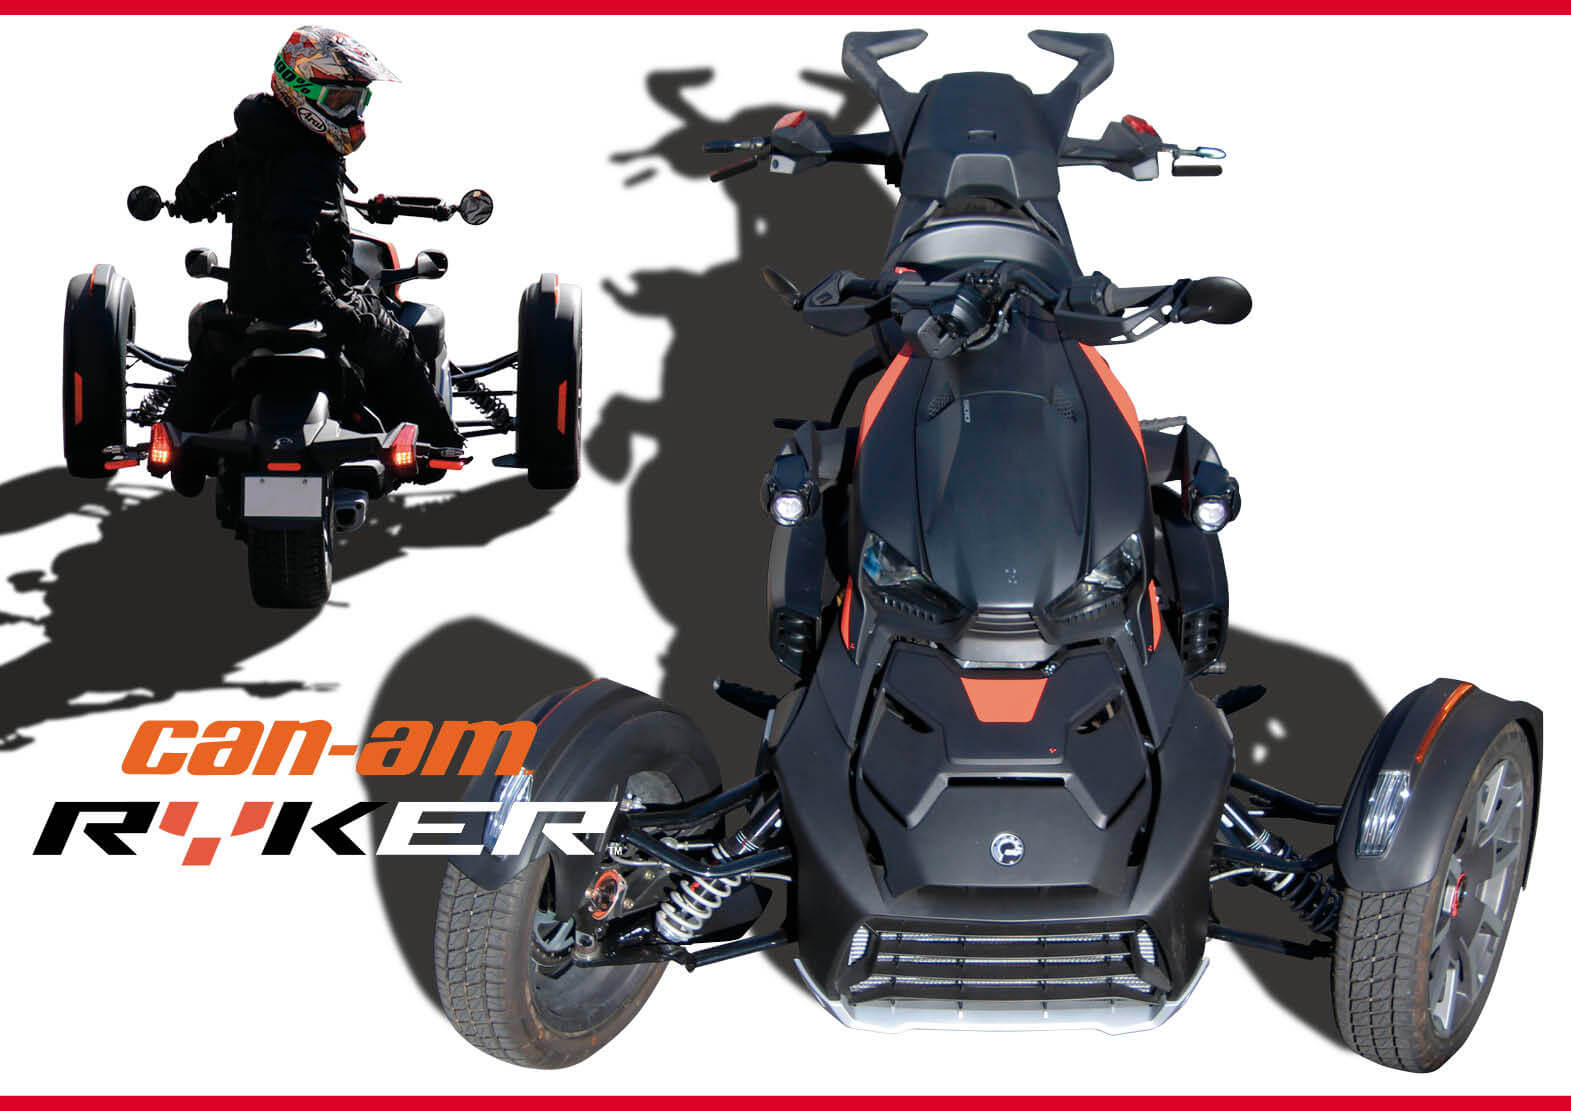 AT限定免許で乗れる 遊び心満載の3輪トライク BRP Can-Am Ryker(カンナム ライカー) ジェットスキー(水上バイク)